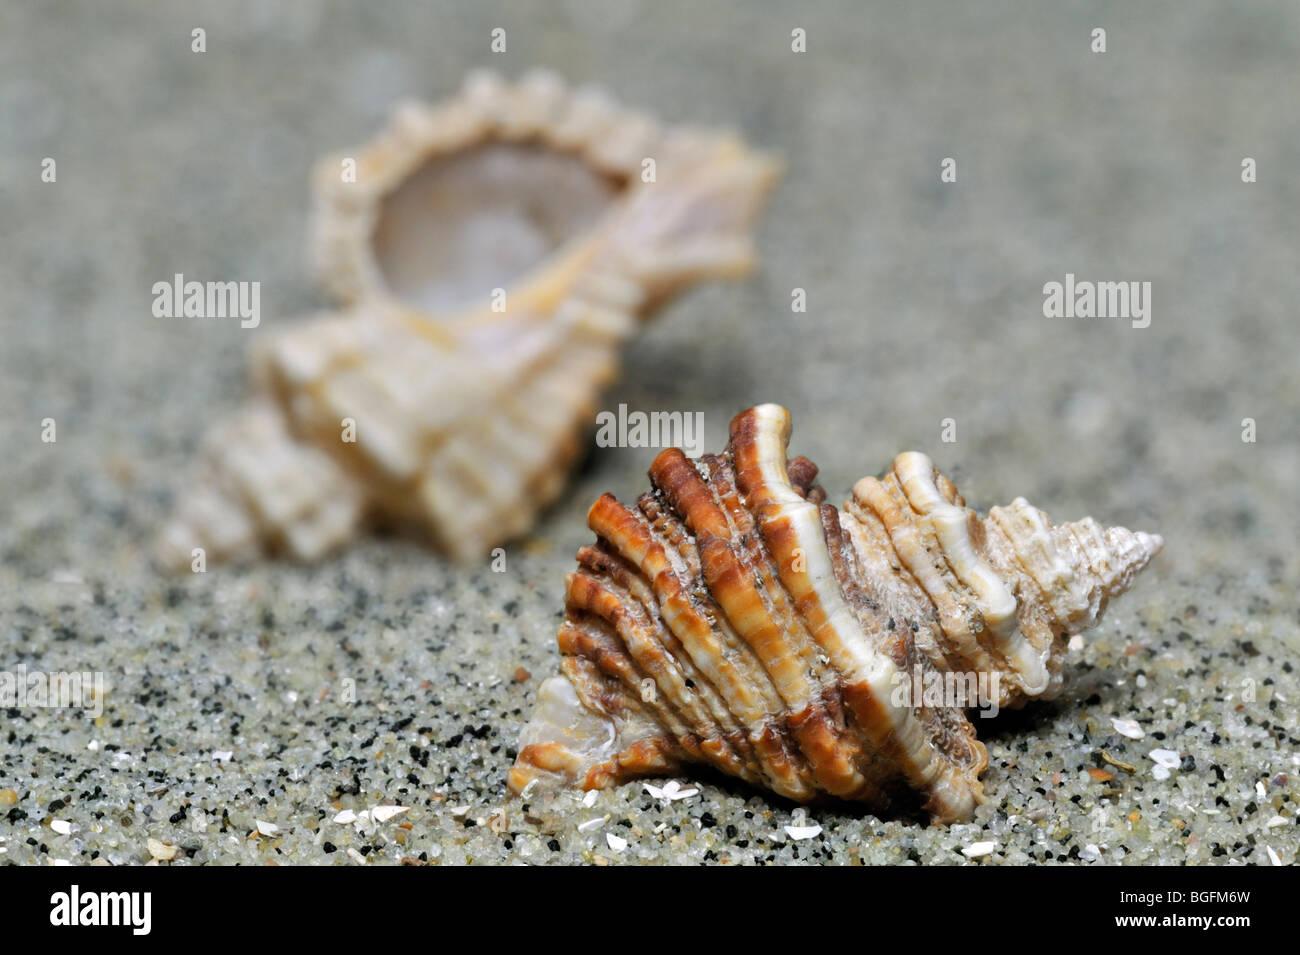 Sting winkle / taladro / Erizo Oyster Murex (Ocenebra erinacea), sobre la playa, Bretaña, Francia Foto de stock